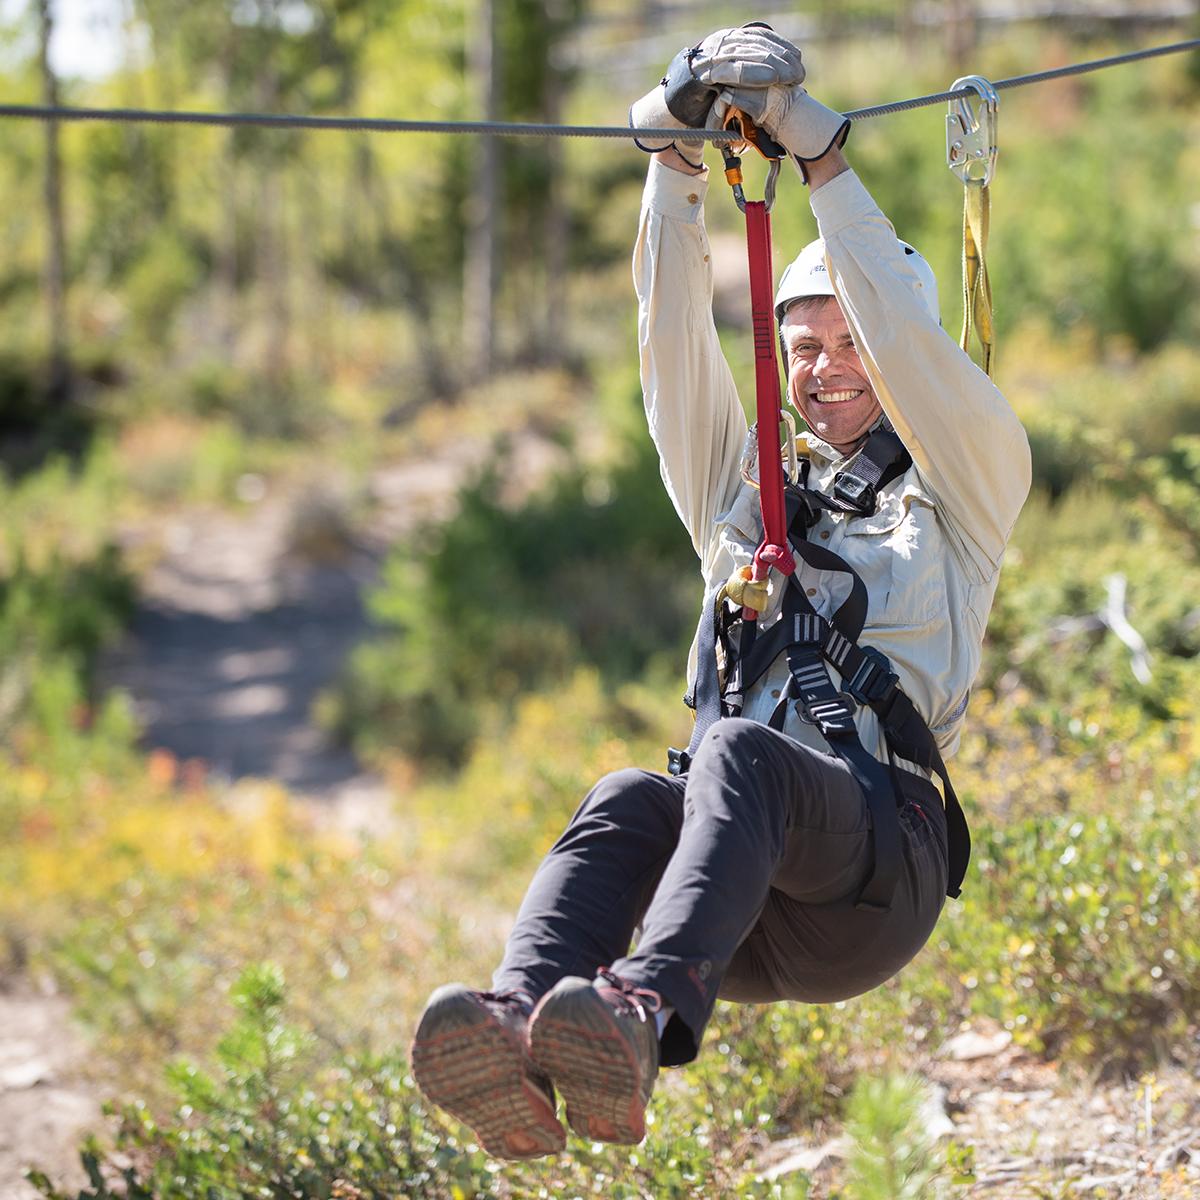 Guest enjoying zipline thrill